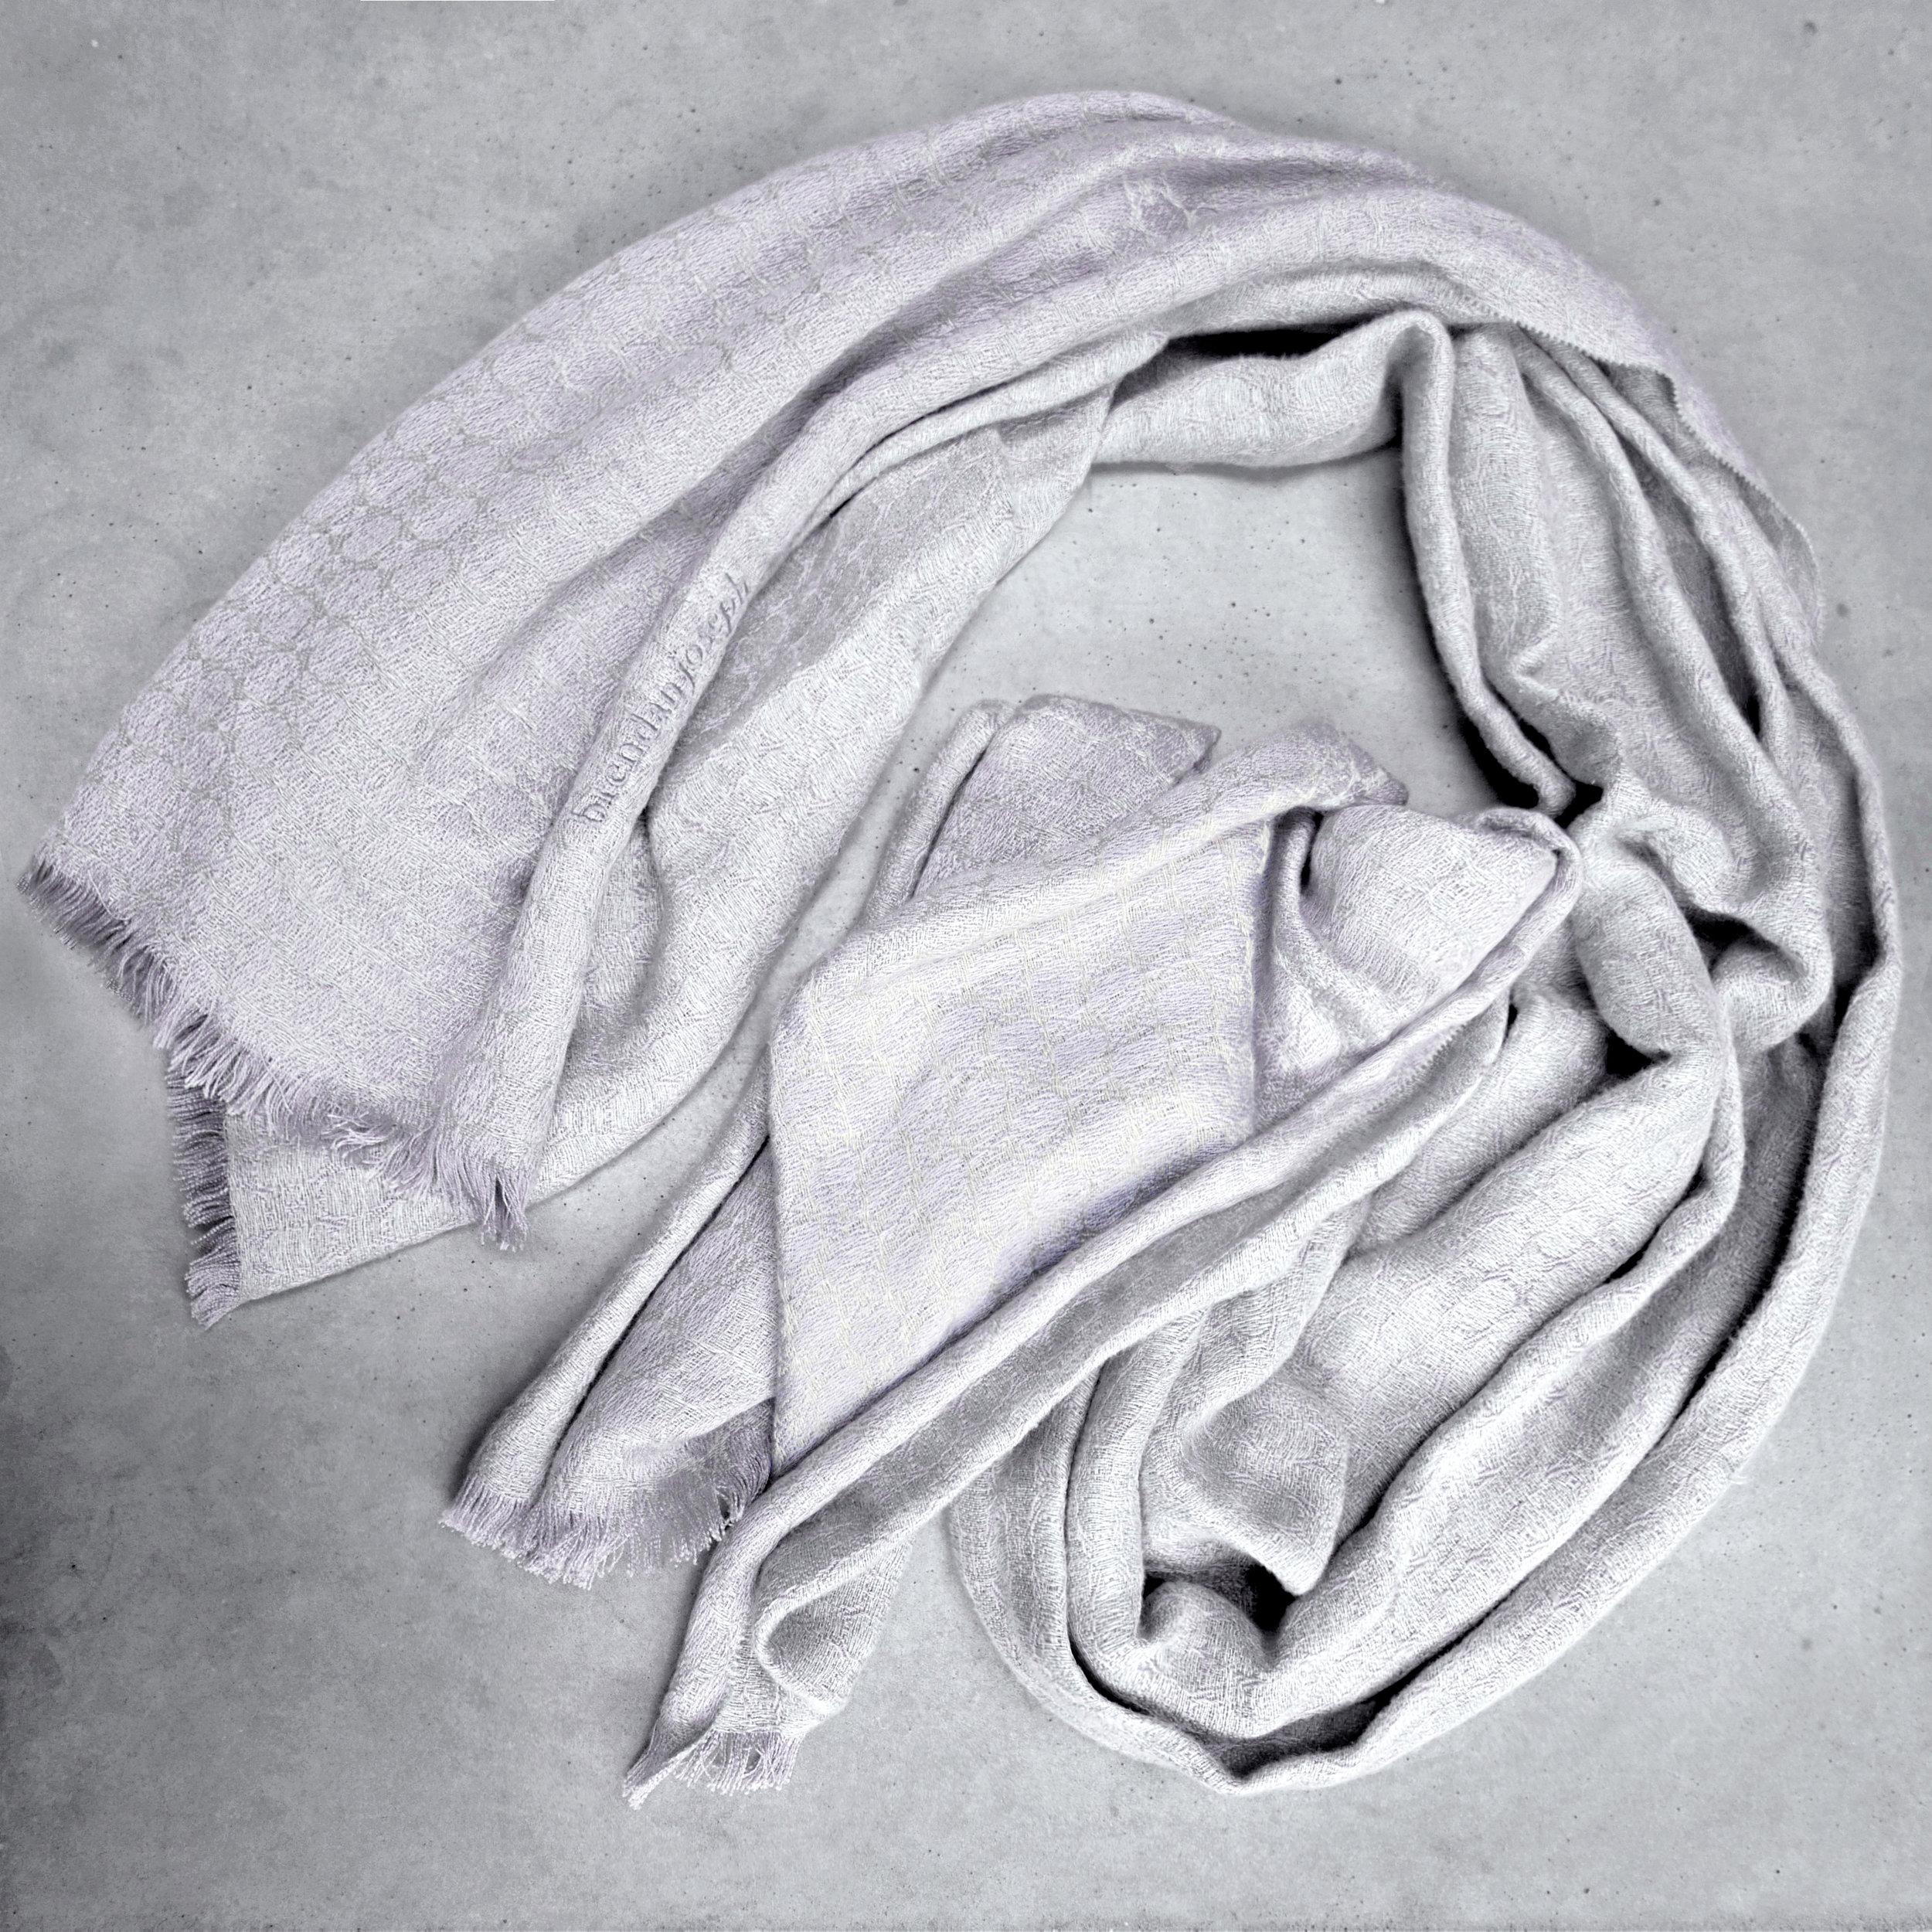 brendanjoseph_silvershore_linen-and-silk-shawl-wrap-stole-pashmina-wedding-corporate-gifts-silver-grey-dublin-ireland-belfast-lough-woven-handmade-in-ireland-luxury-designer-scarf